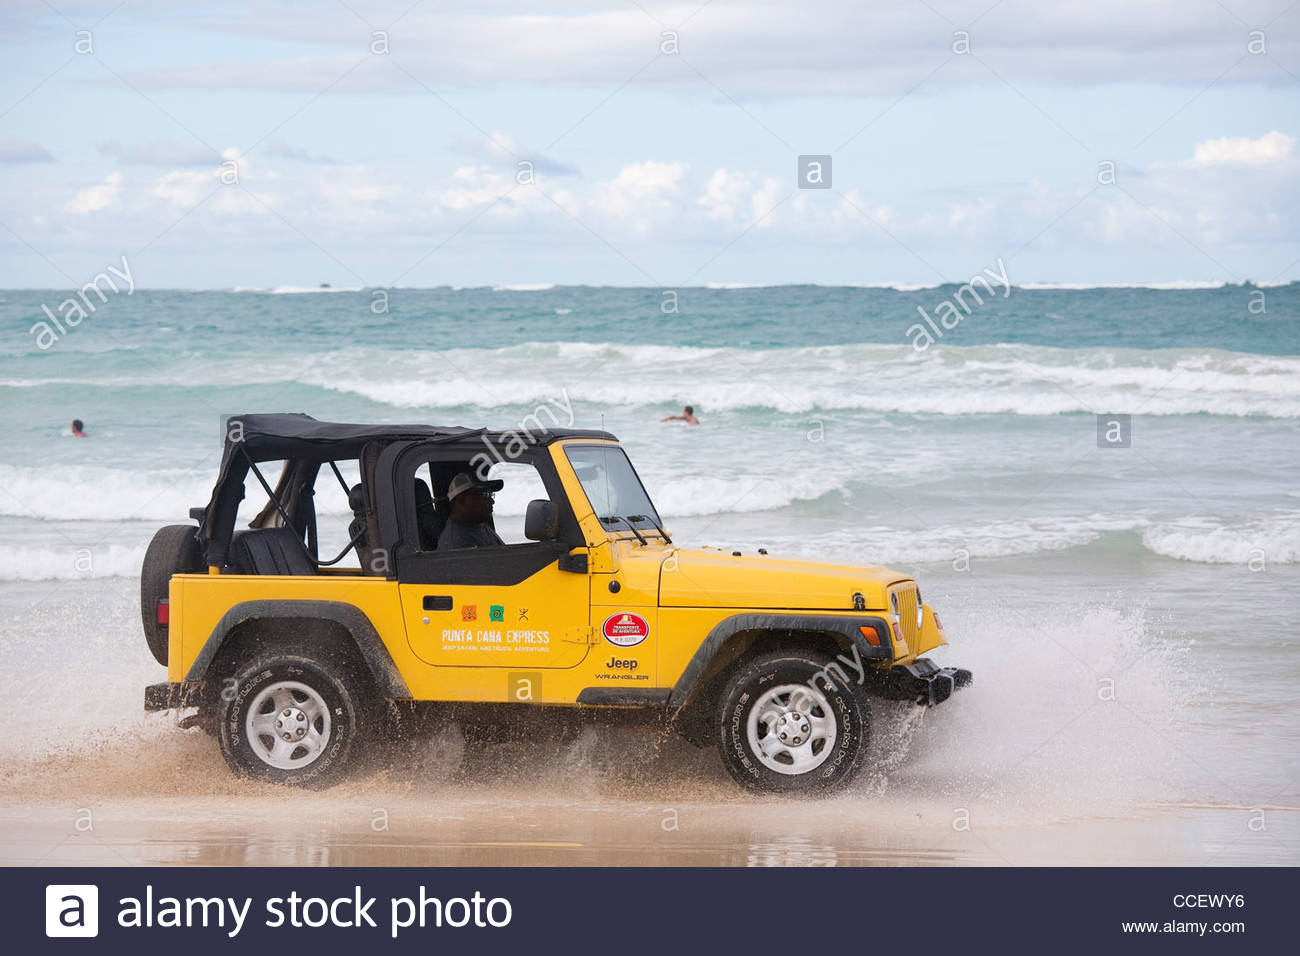 jeep on the seashore,the area of Punta Cana,Hispaniola,Dominican Republic,Caribbean - Stock Image